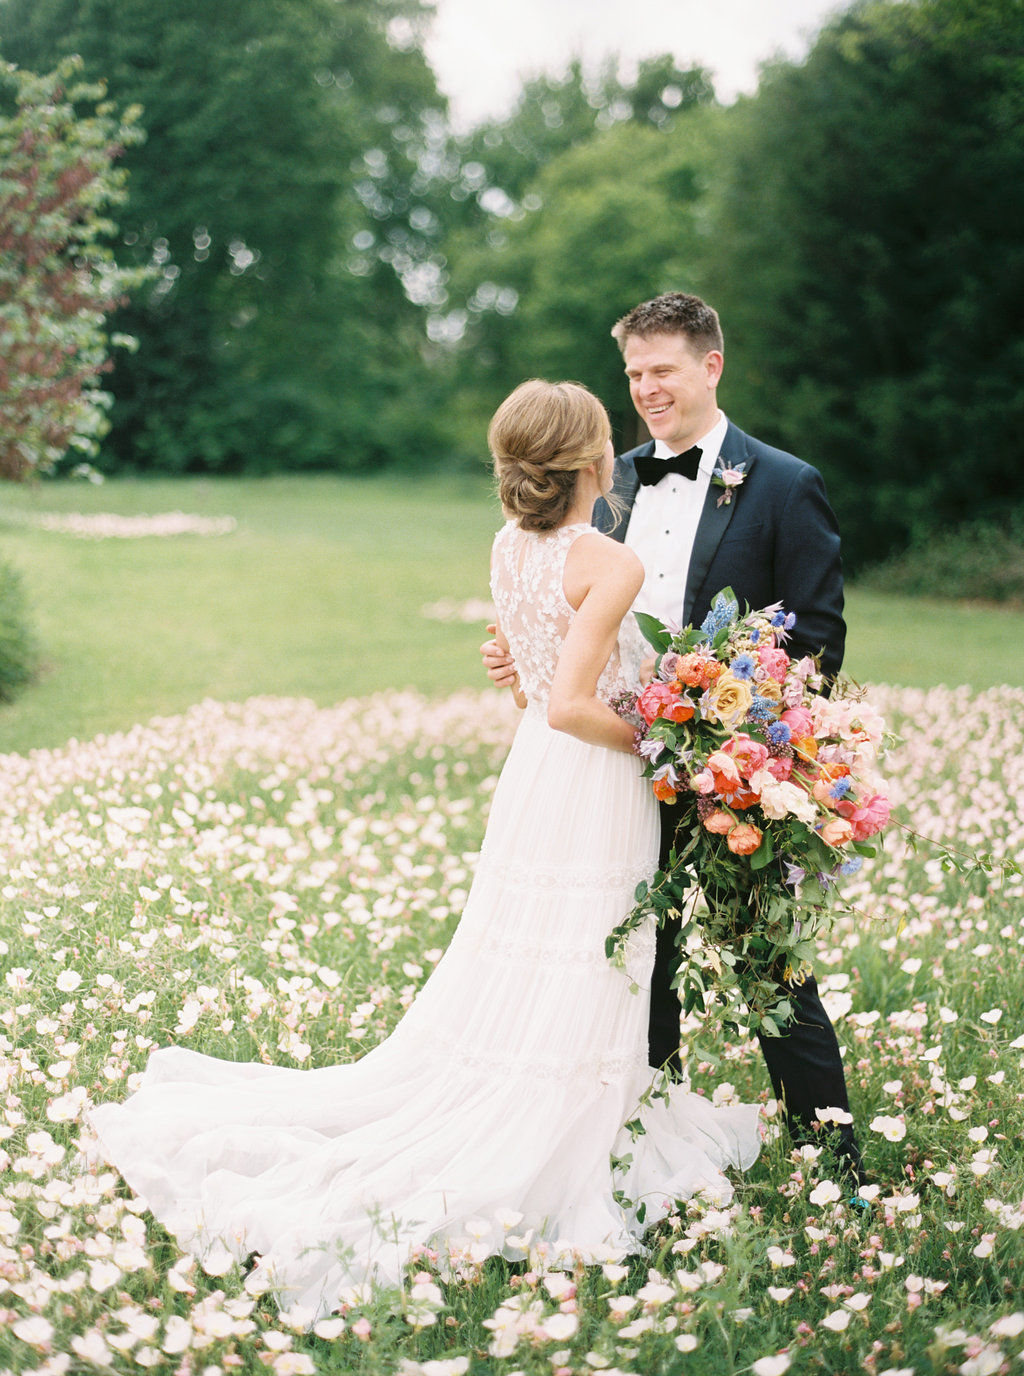 aprylann_wedding_519.jpg